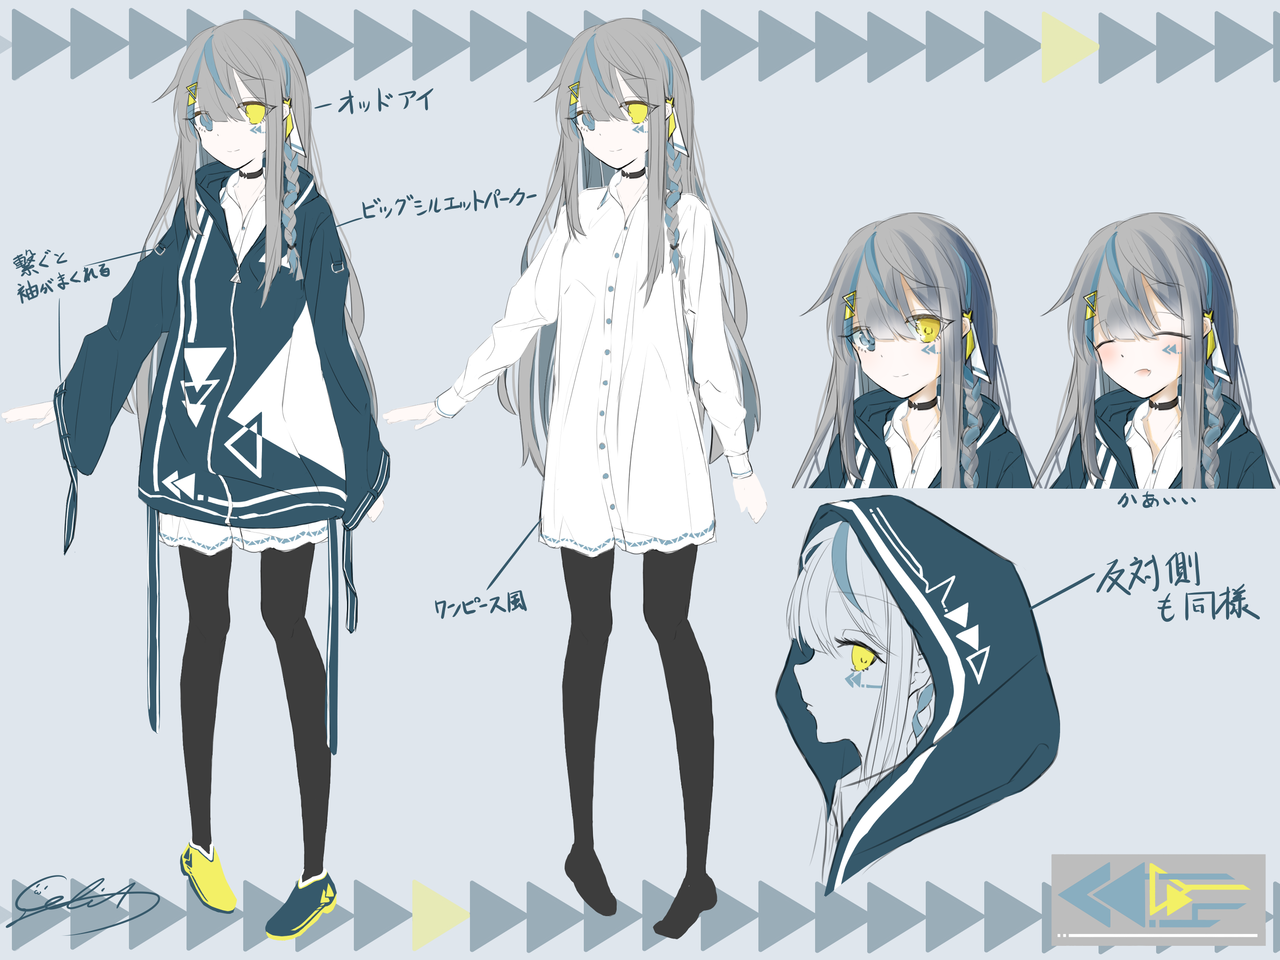 Tria Illust of Celia_しりあ girl oc